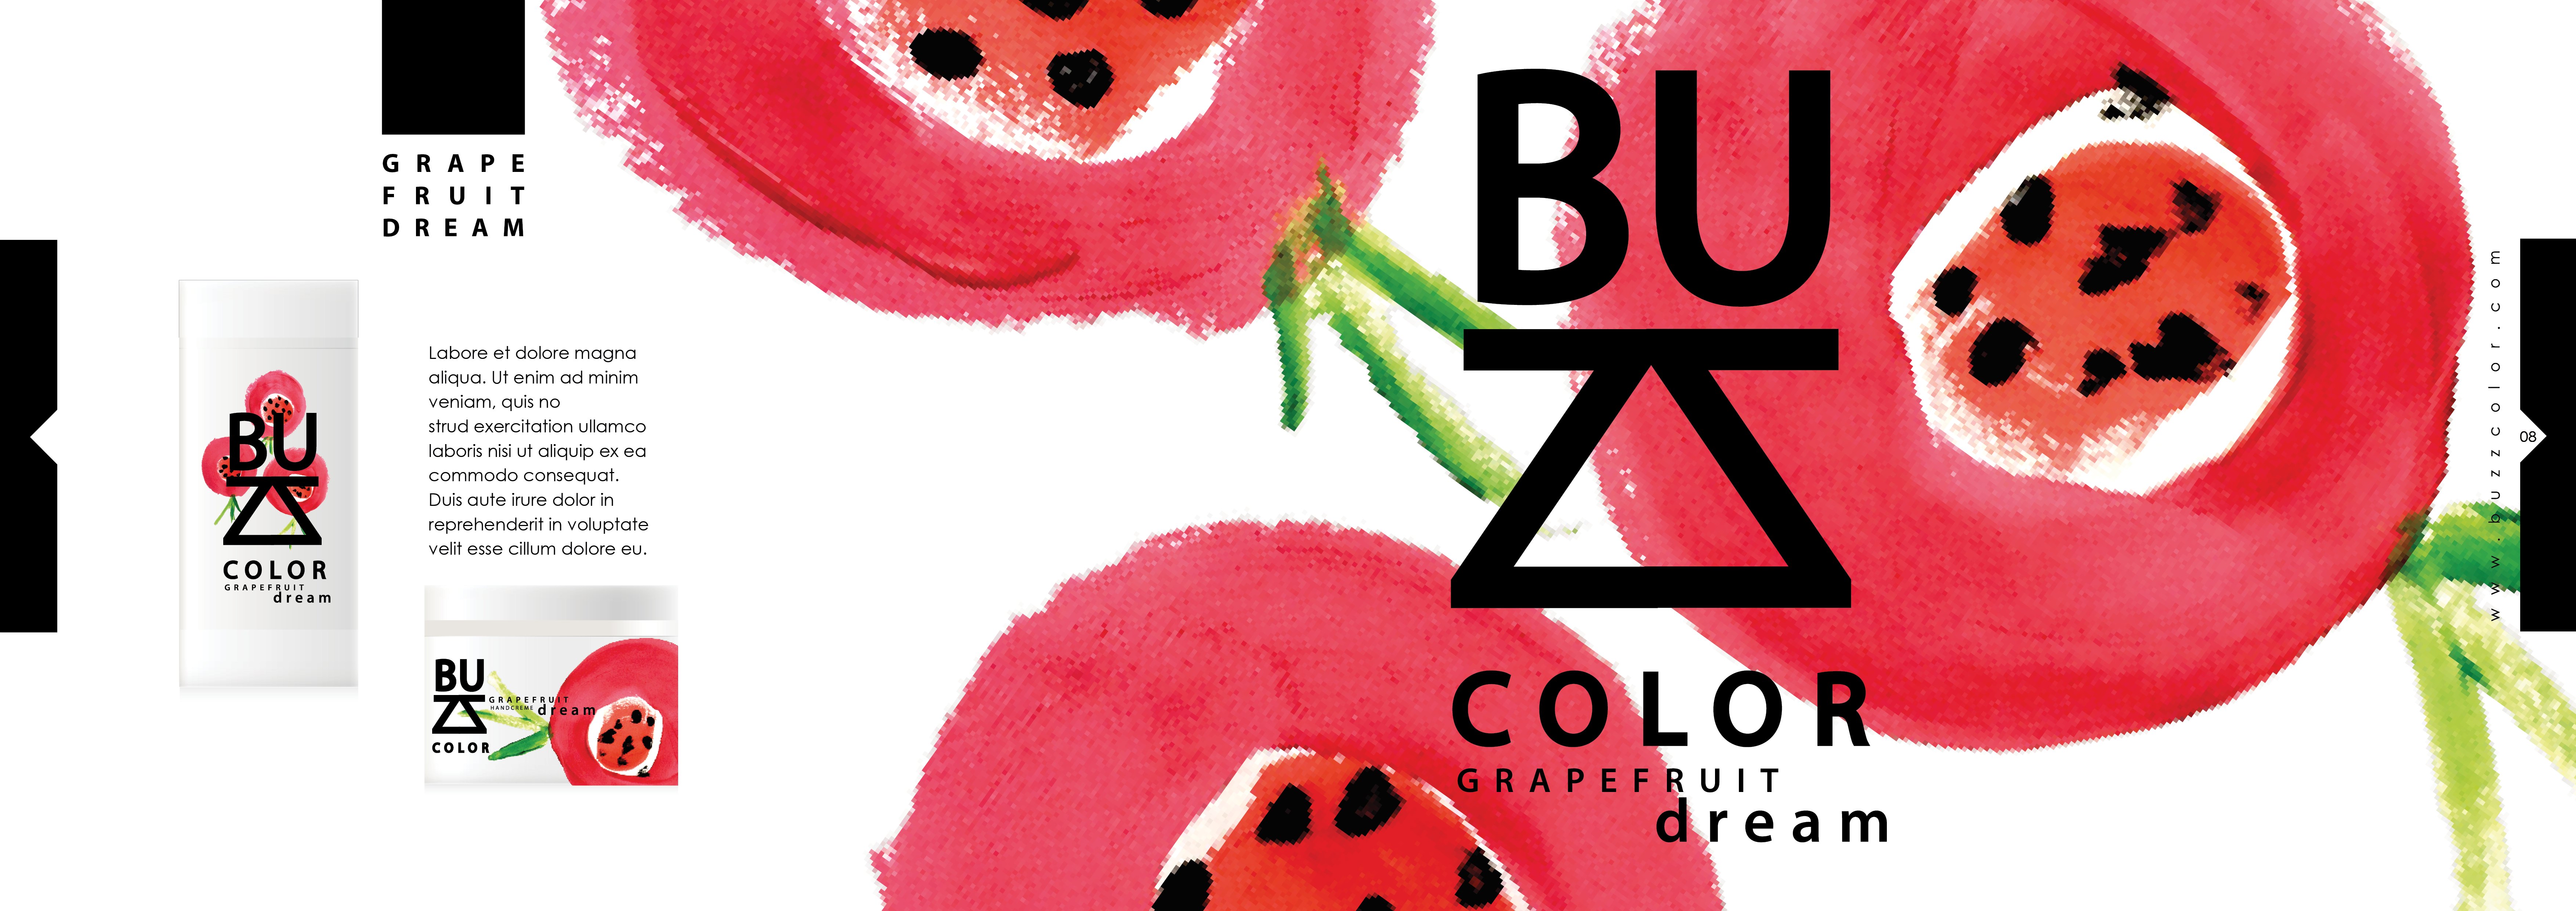 brandbookbuzzcolor5